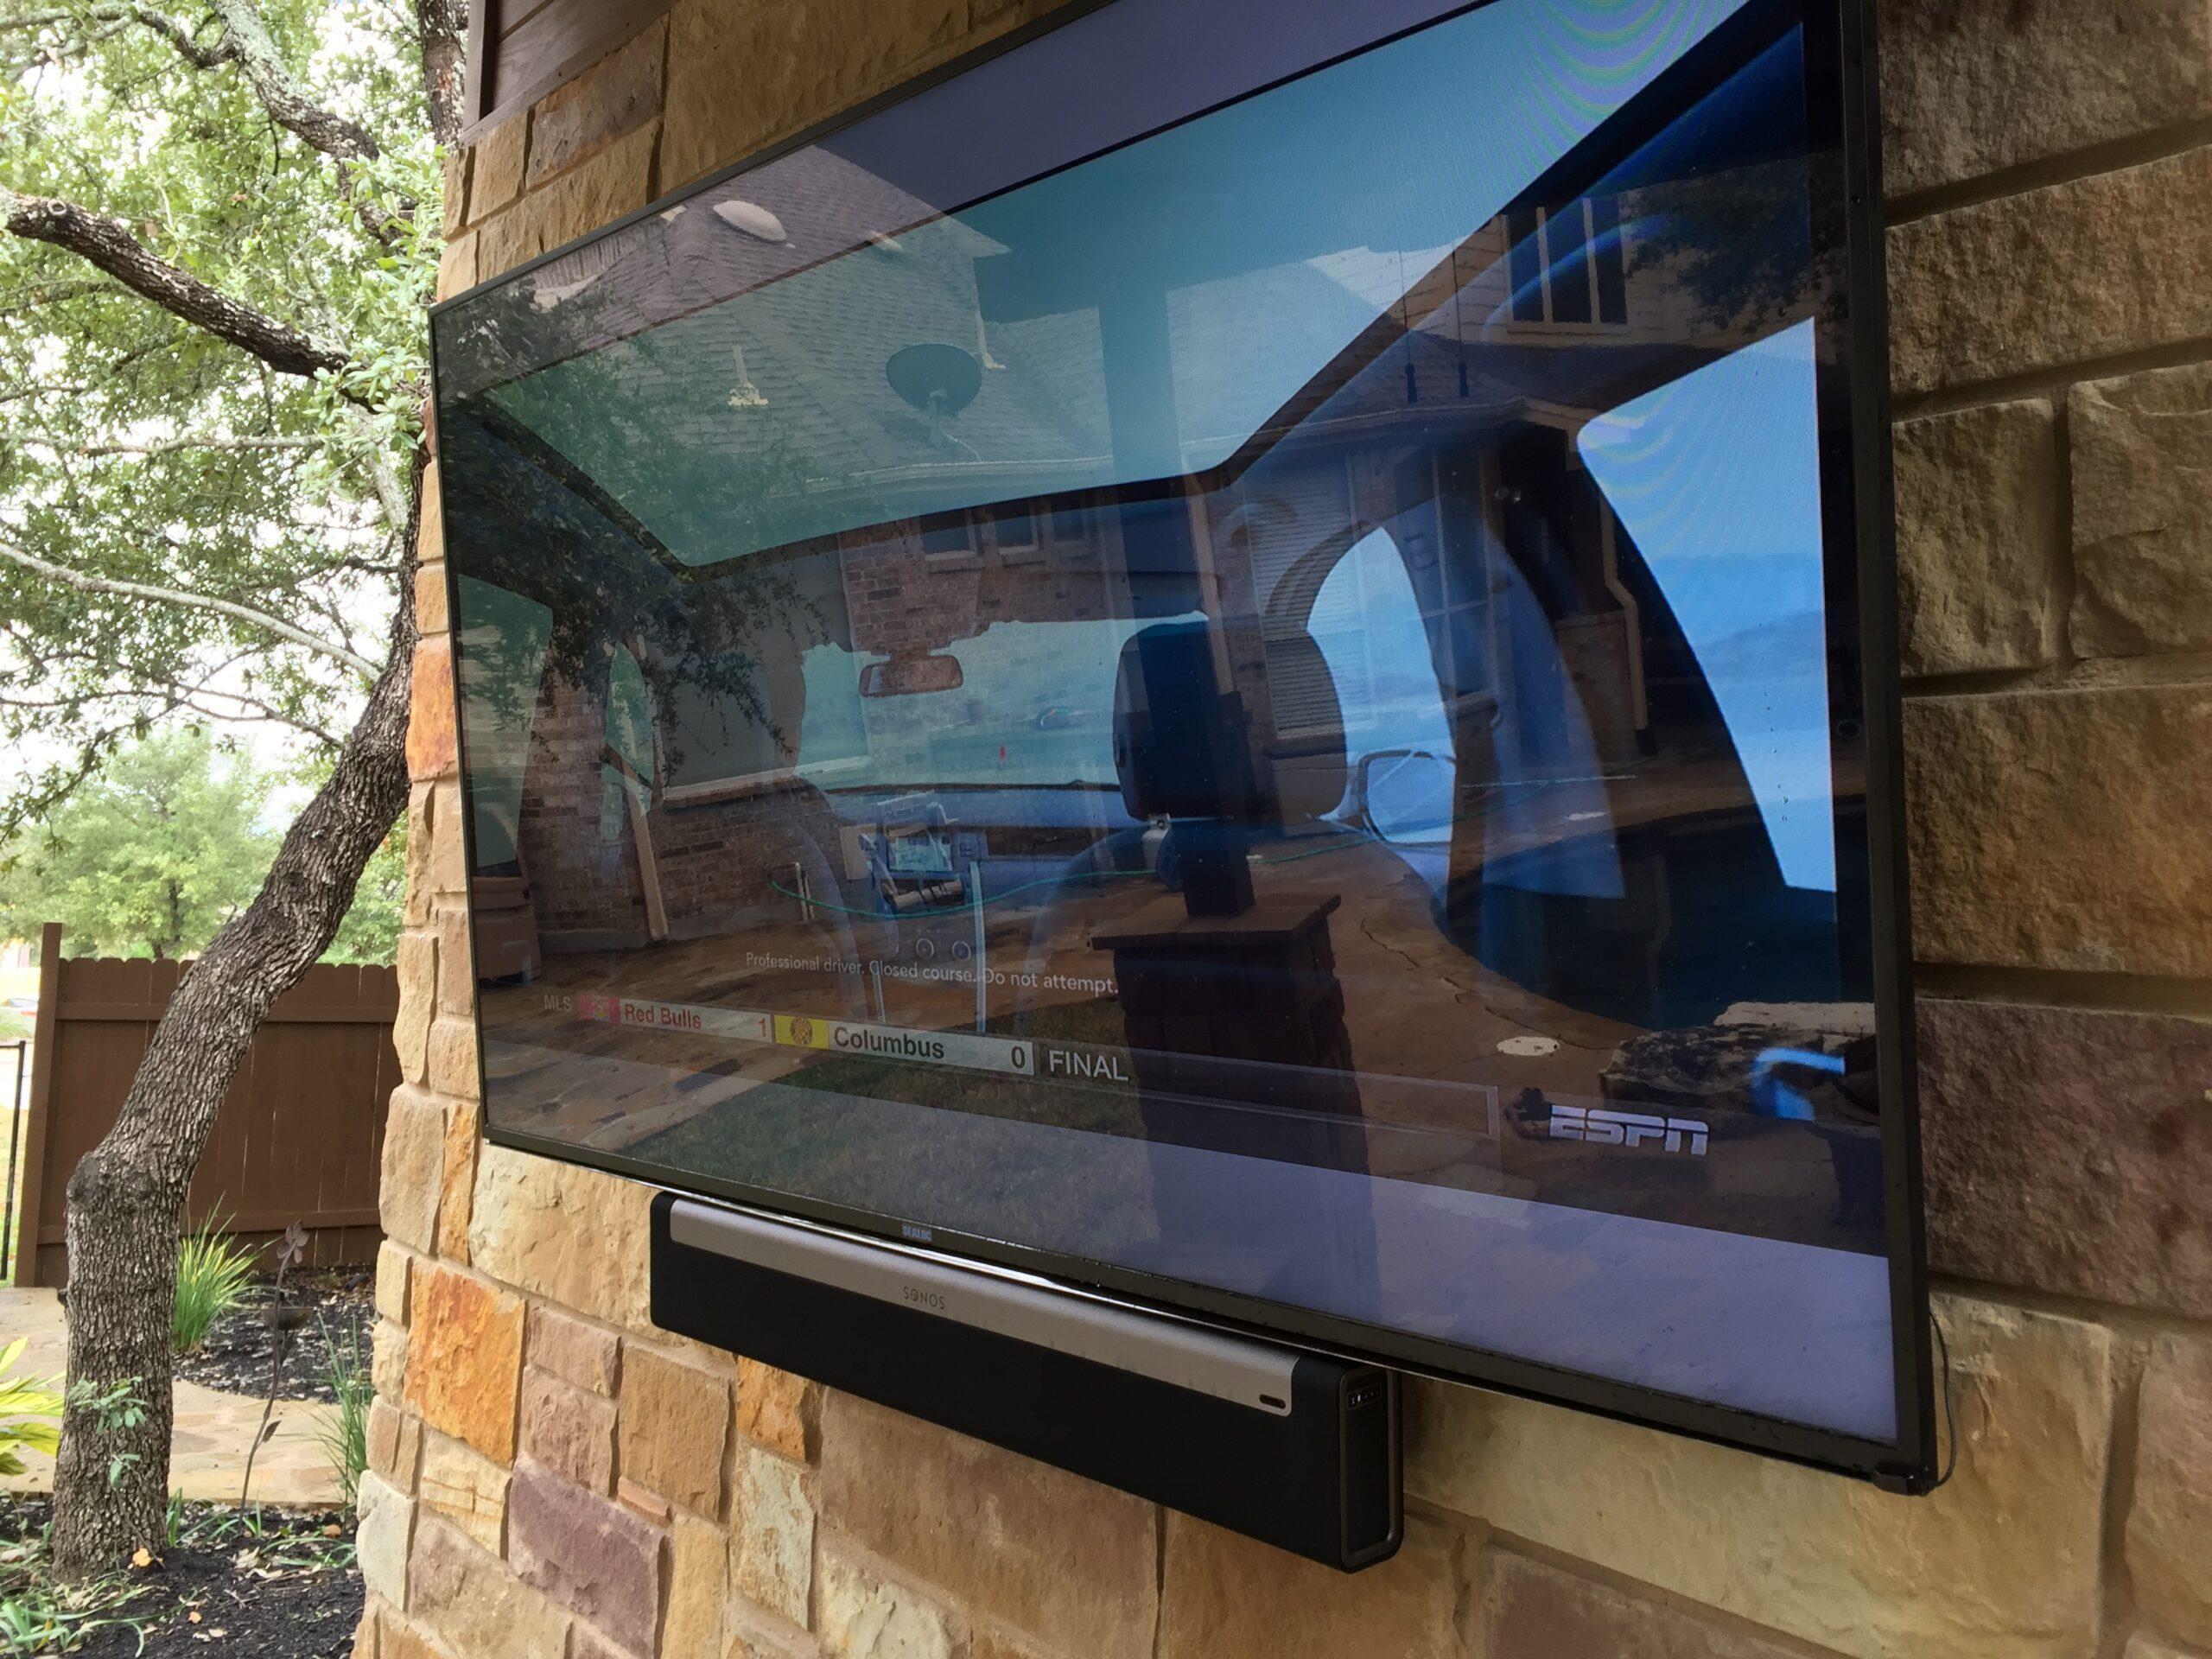 Outdoor weatherproof TV mounted on brick wall